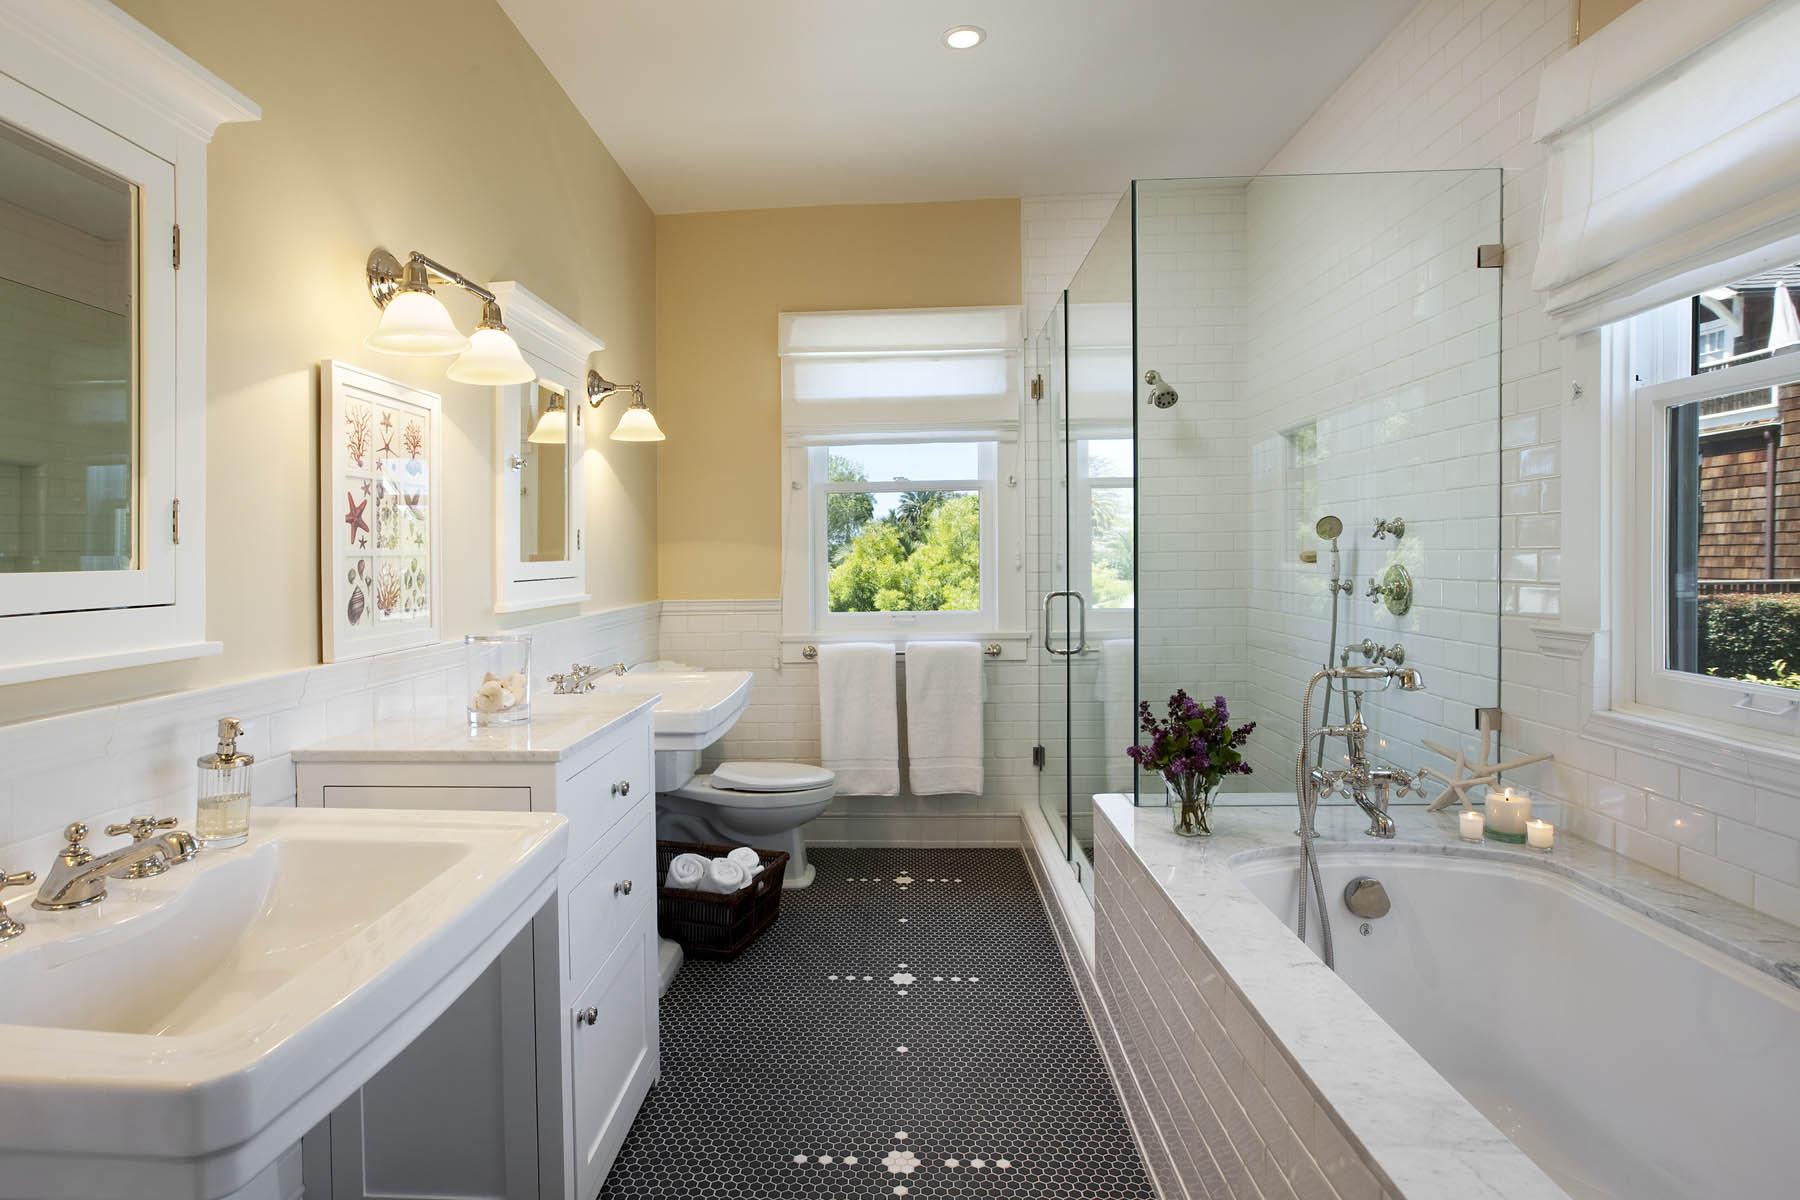 Barberi bathroom